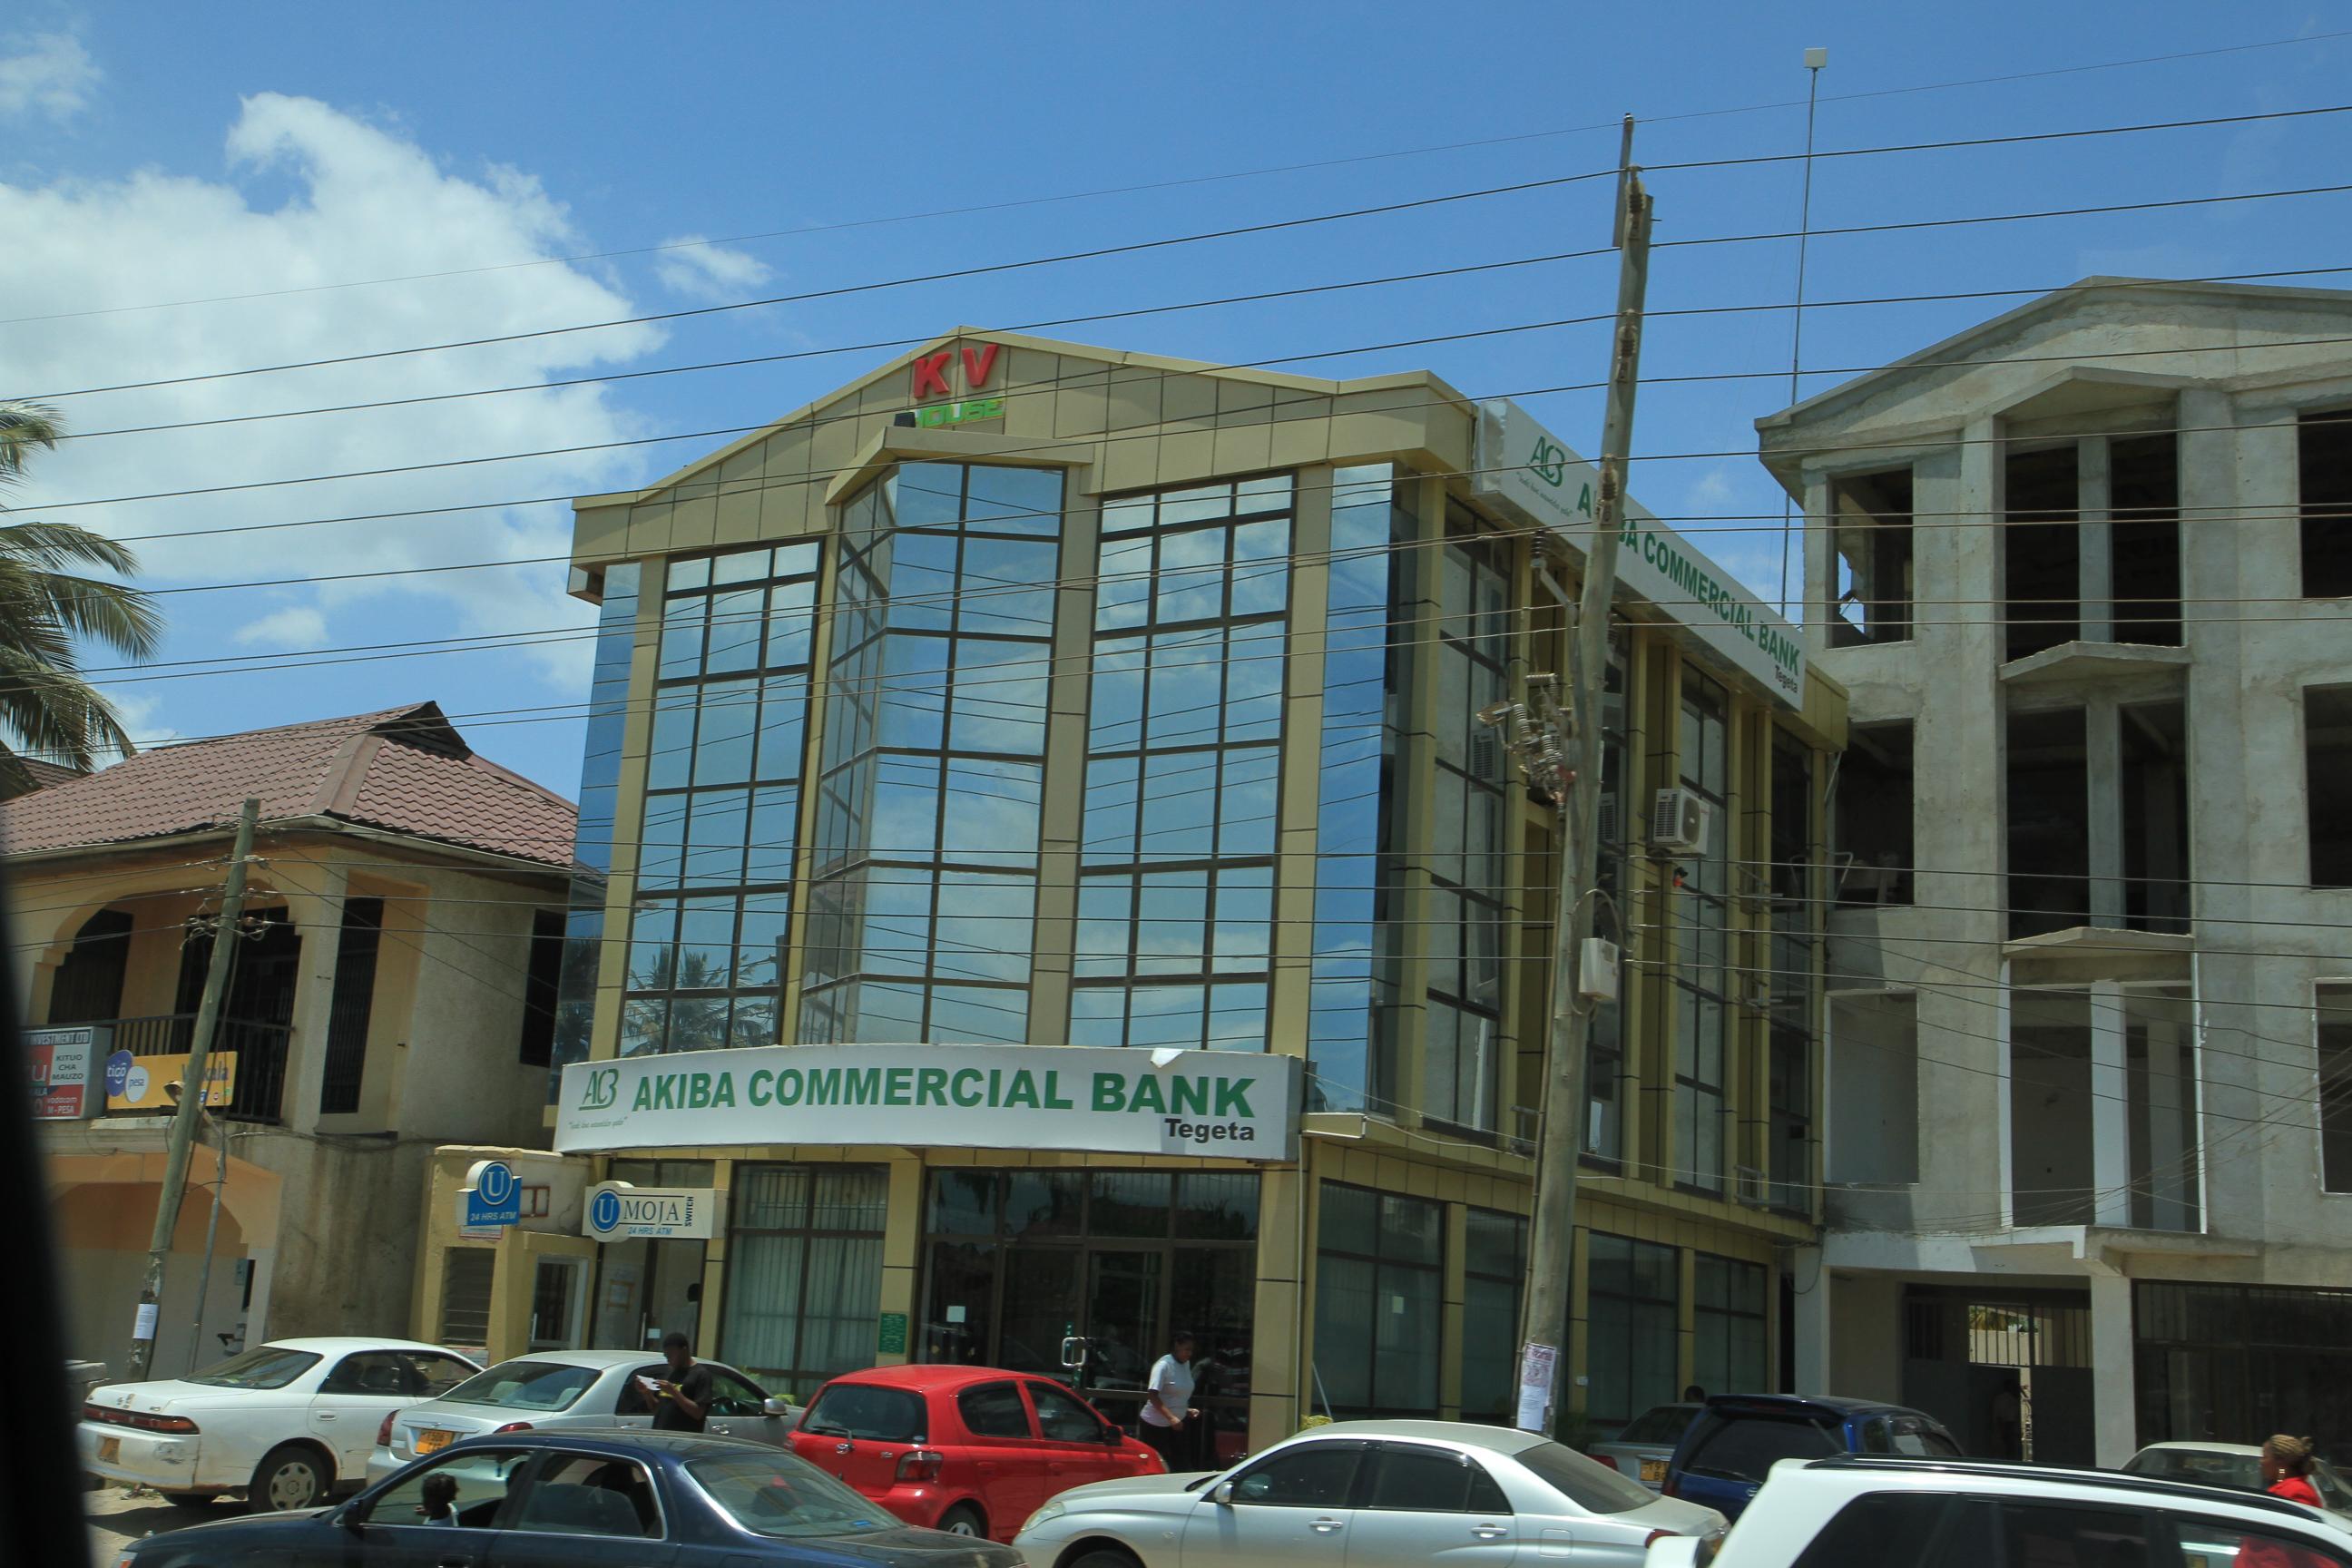 Akiba Commercial Bank - Wikipedia